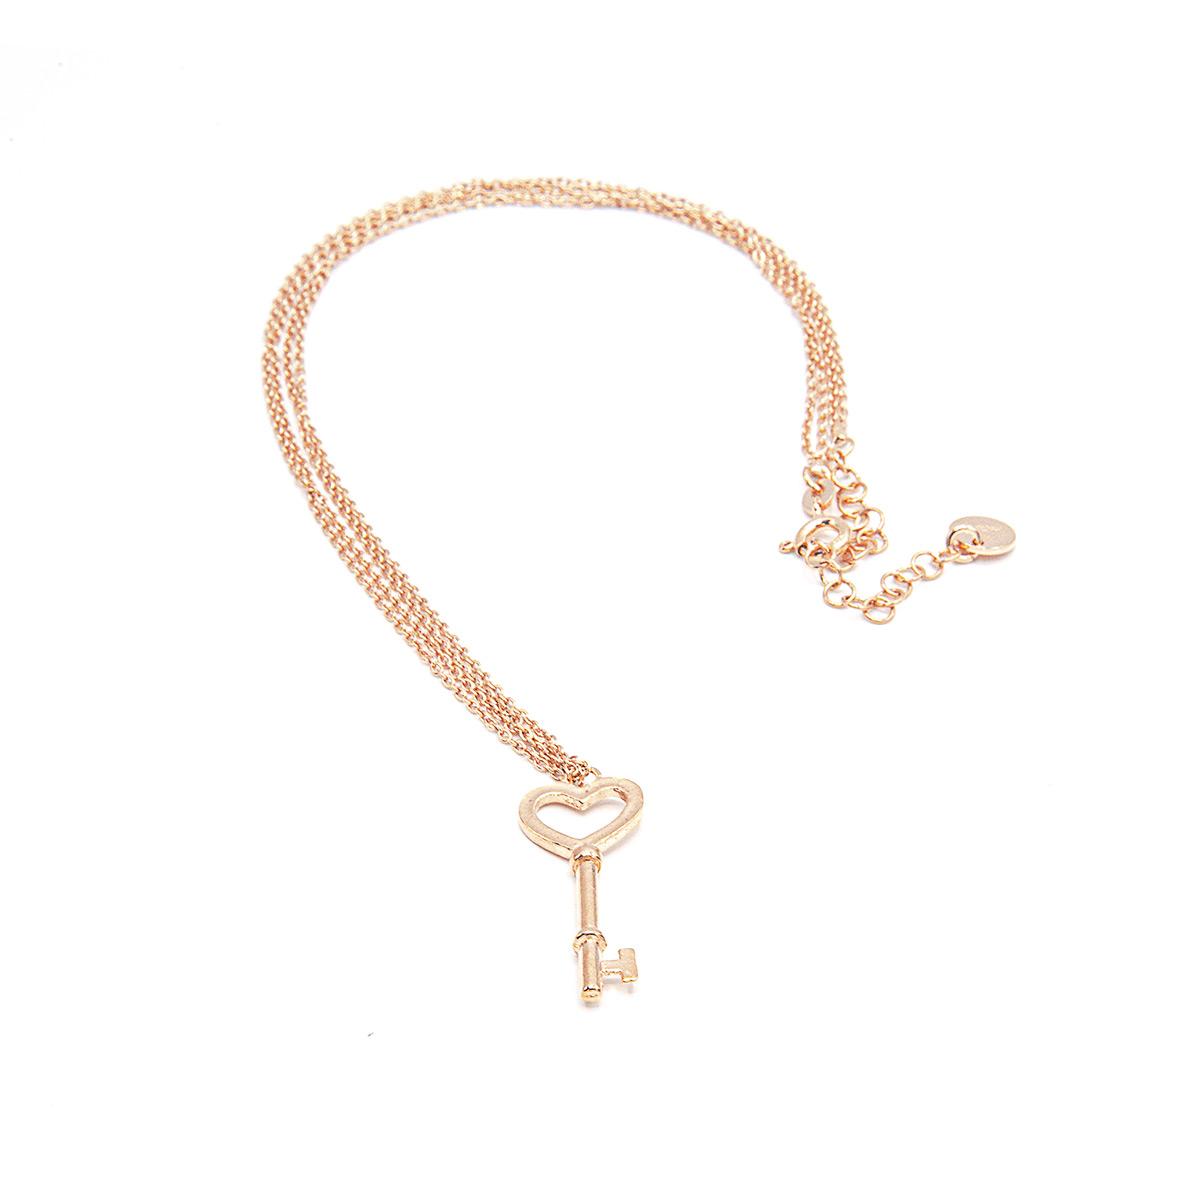 Halskette lang und Schlüssel rosé vergoldet